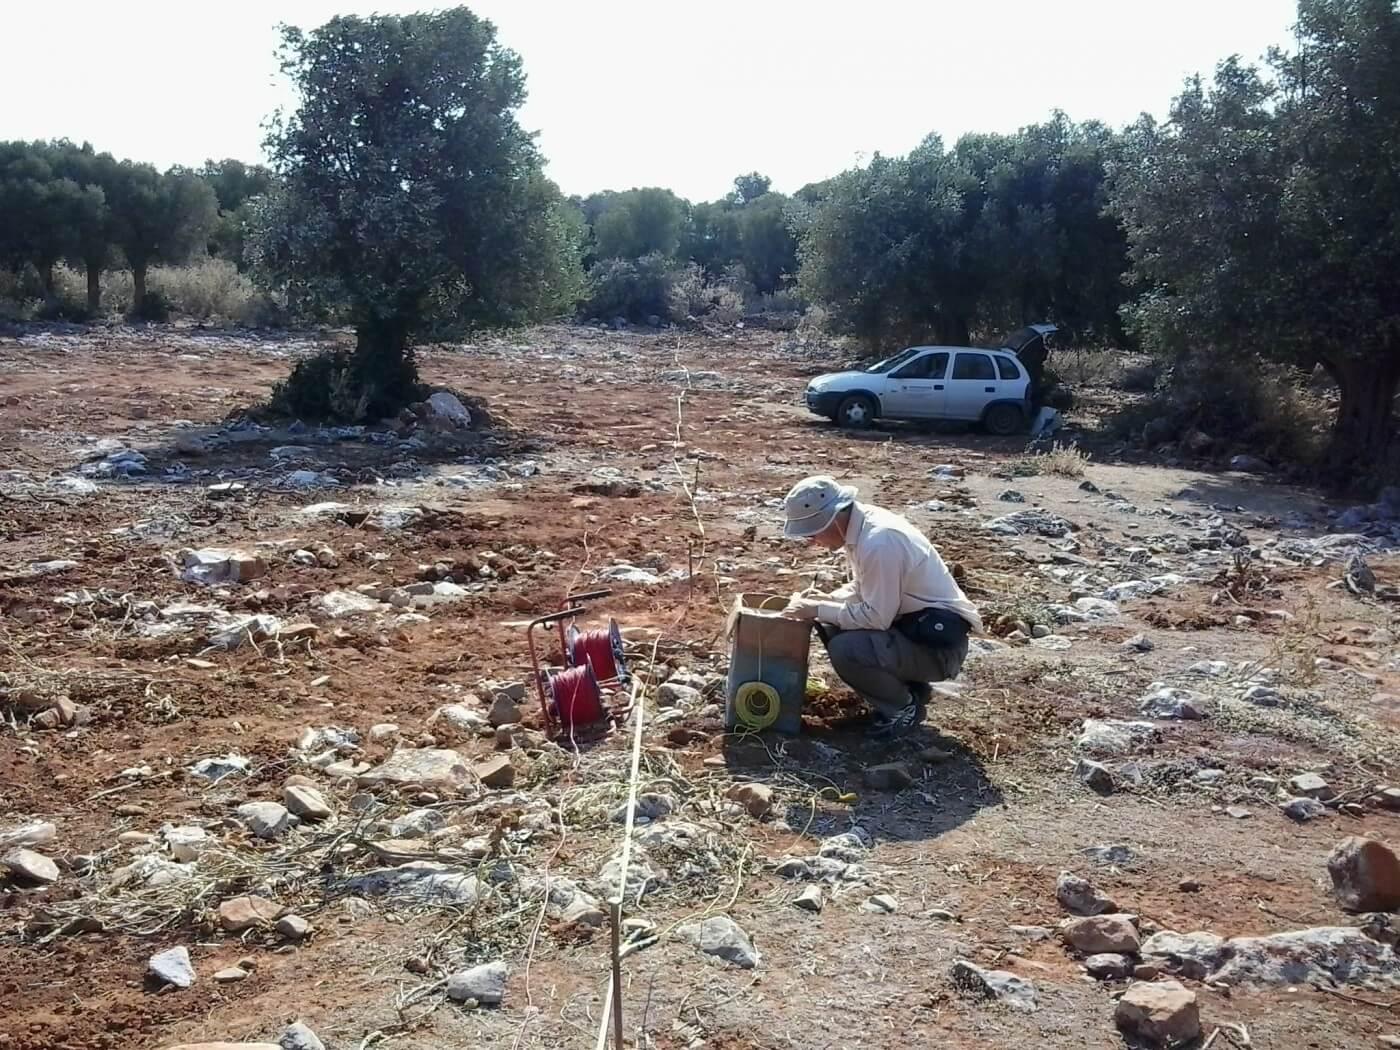 Polypotamos-2012-07-18-09.46.54